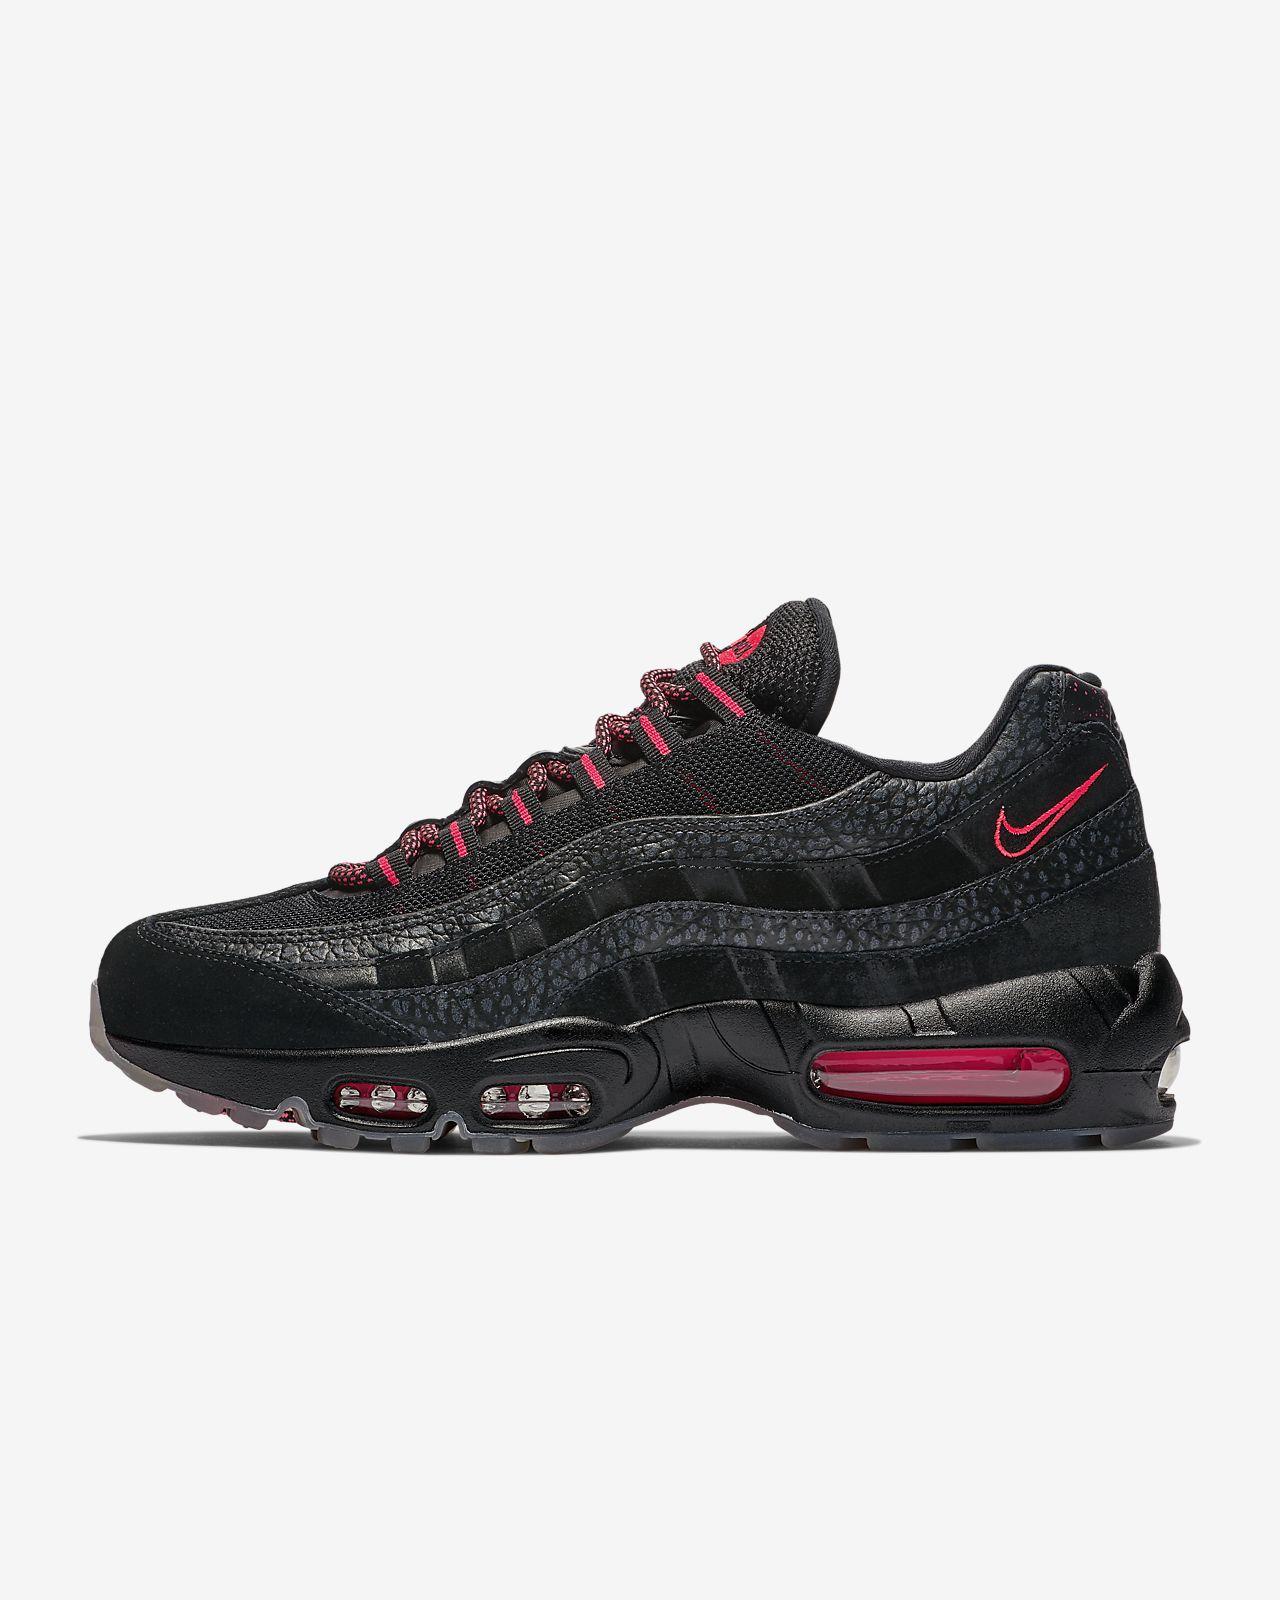 hot sale online 6896f a9a61 Men s Shoe. Nike Air Max 95